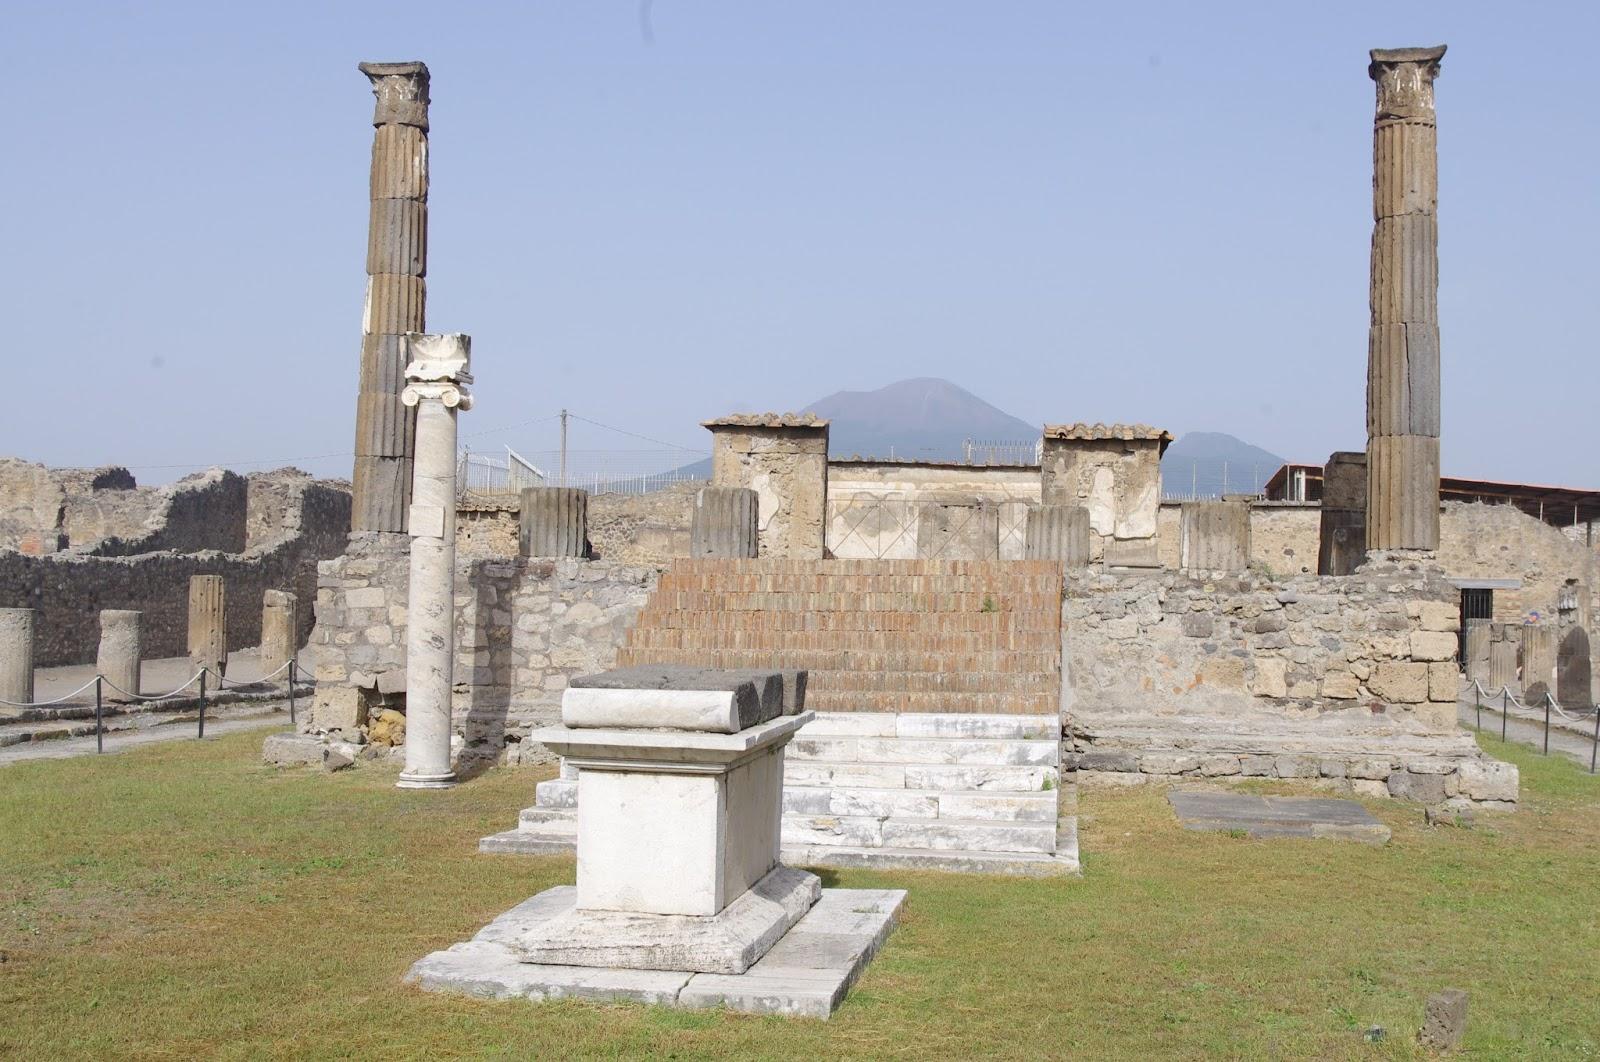 Ruins in Pompeii with Mt Vesuvius in background